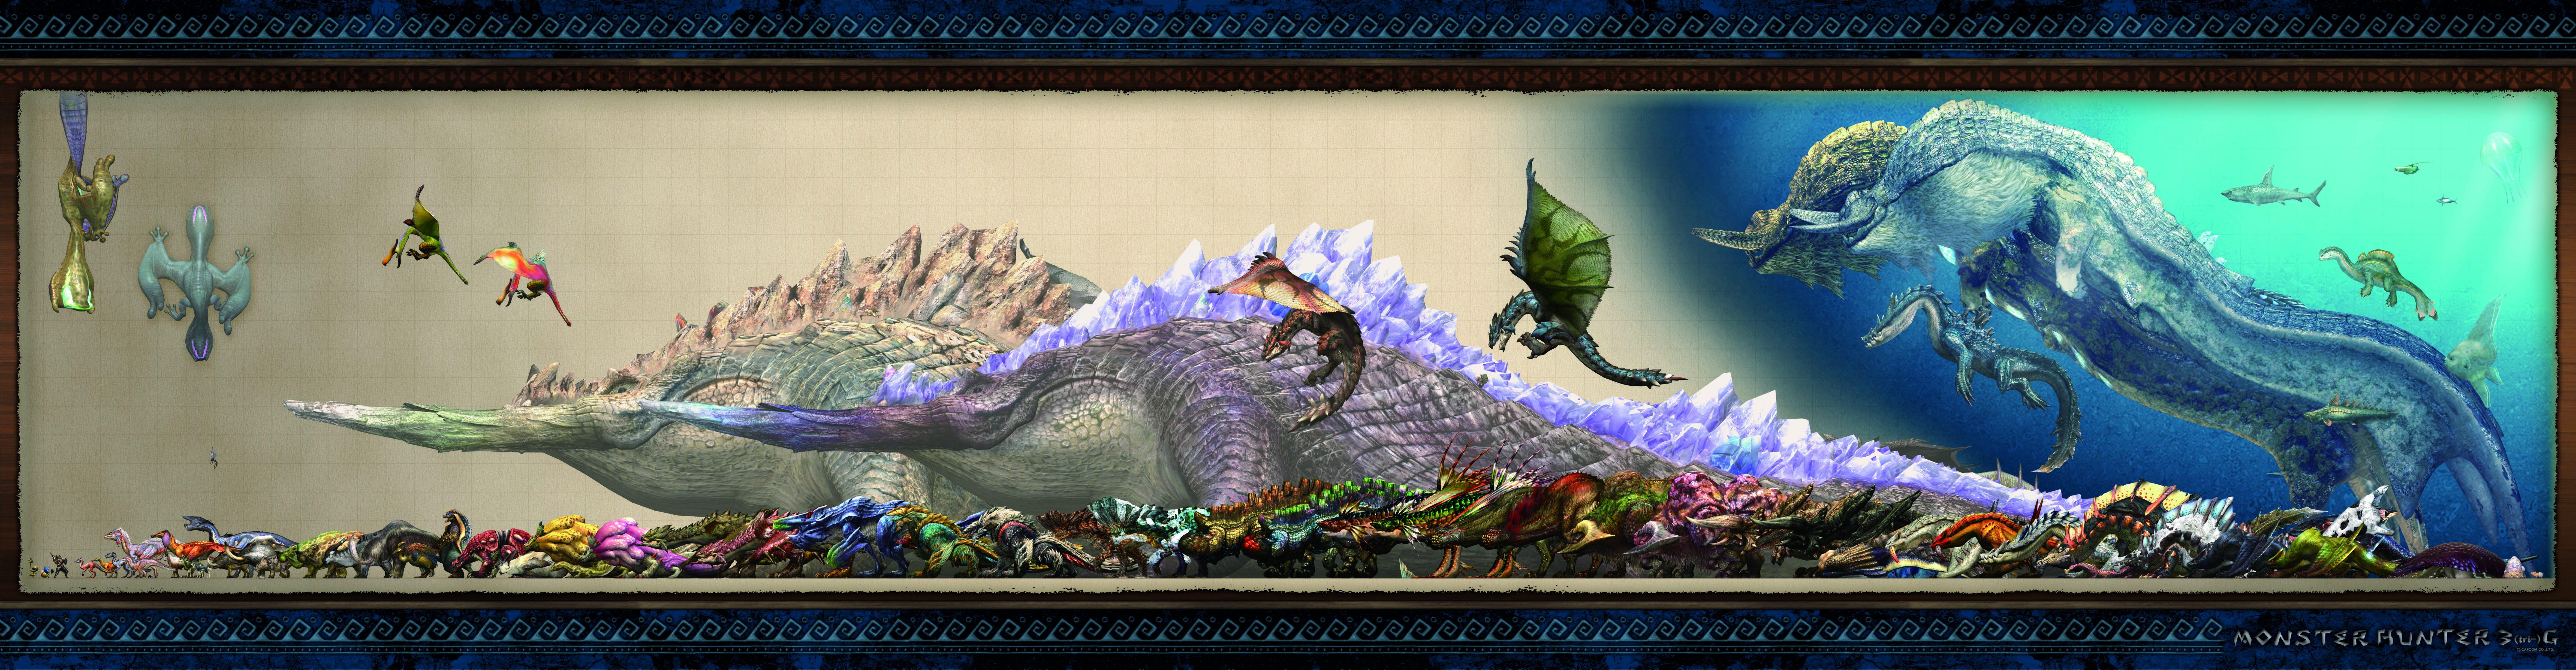 Monster Hunter Online Mmo Rpg Fantasy Hunting 1mhf Action Dragon